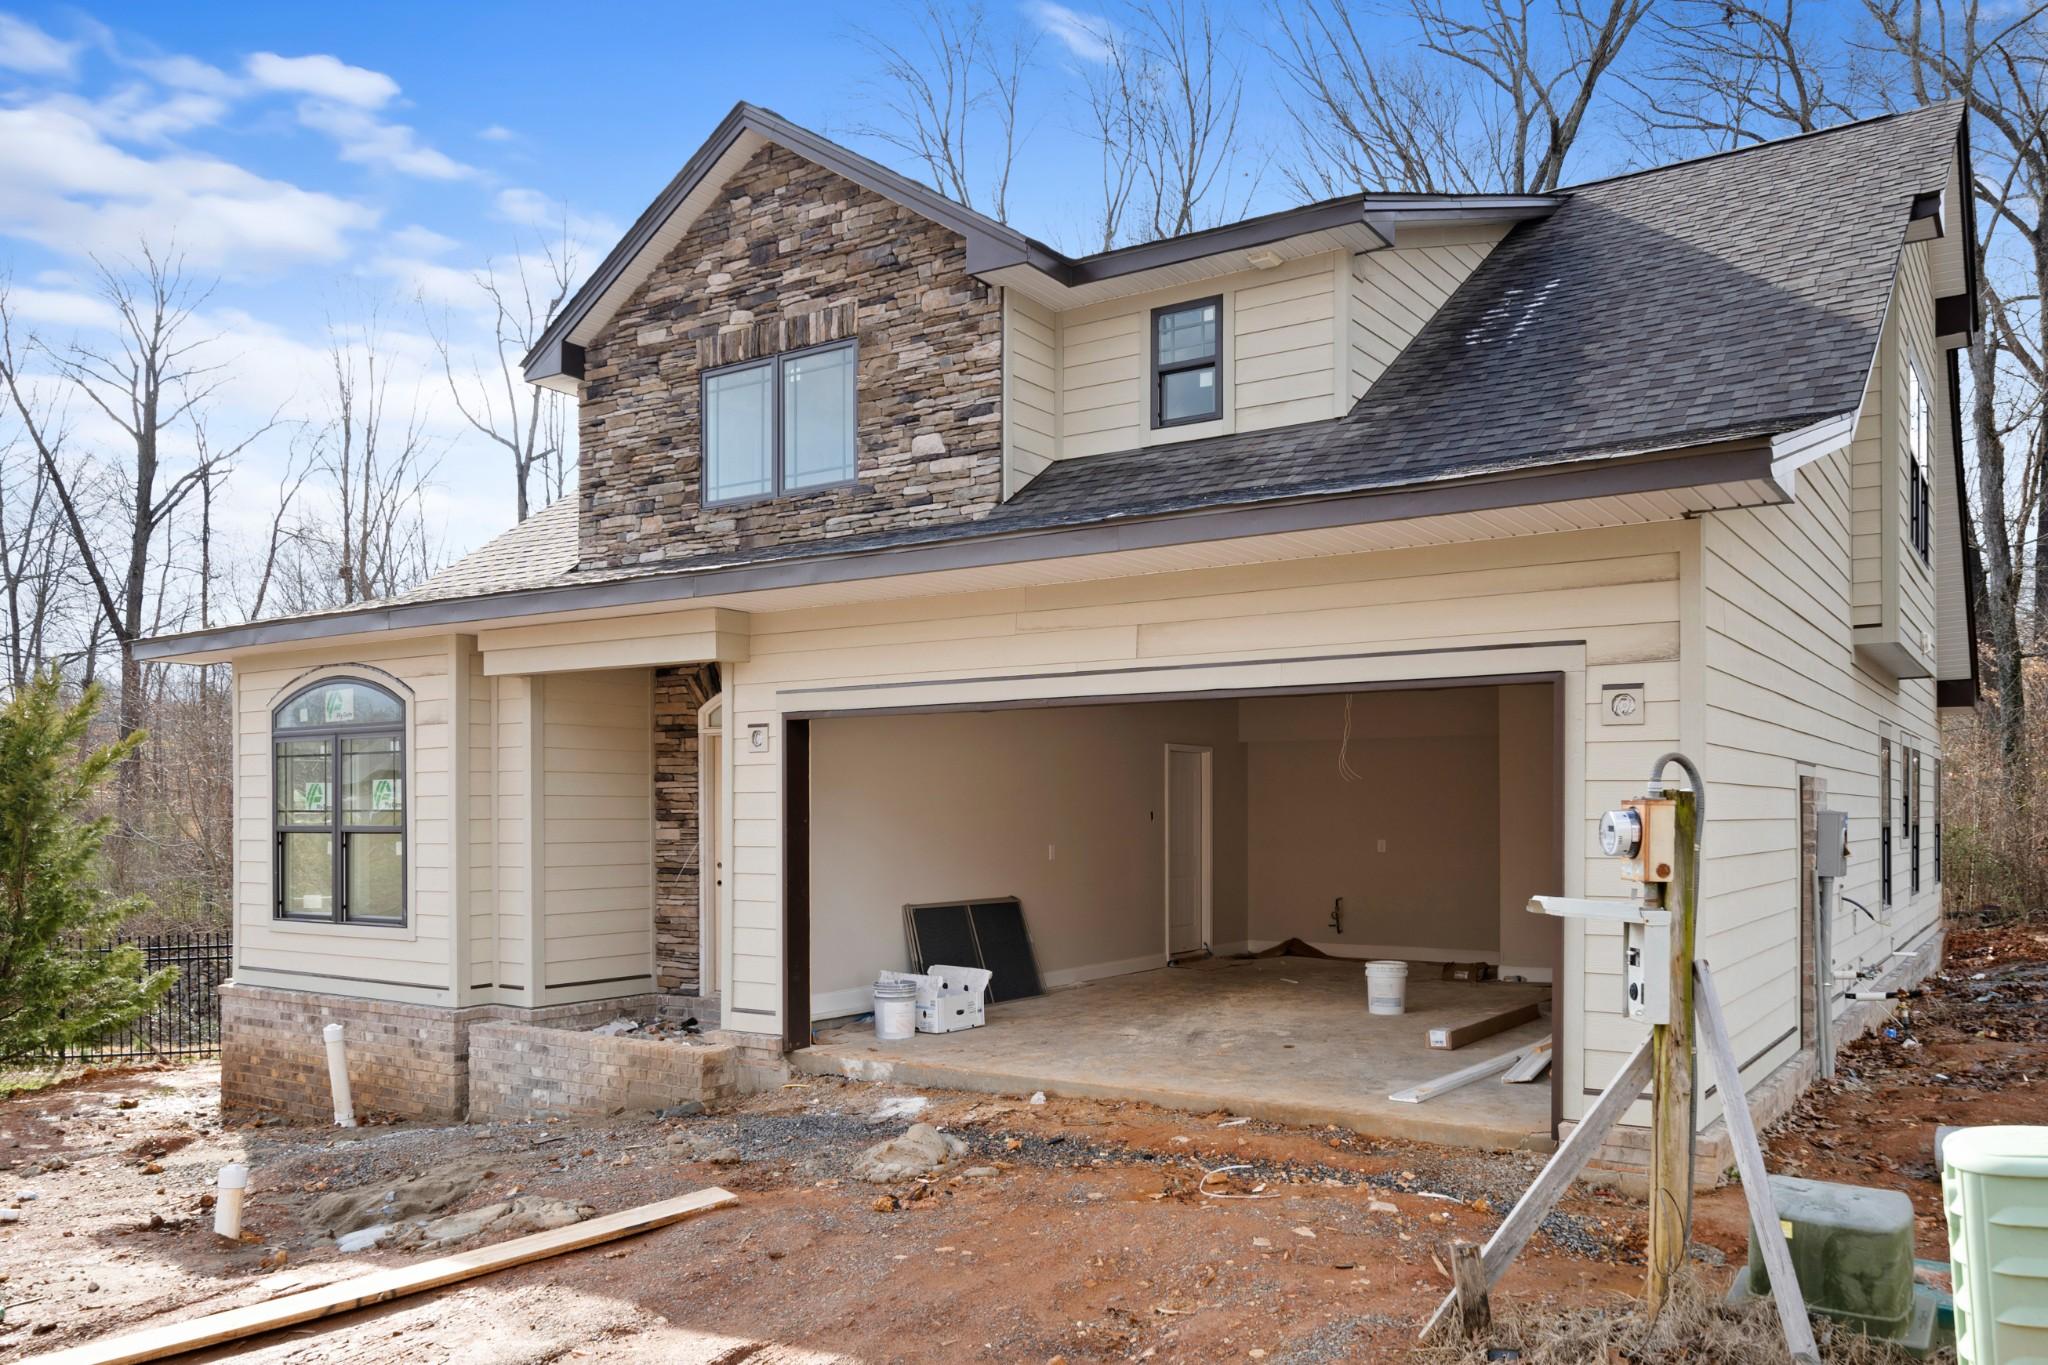 506 Summit View Circle, Clarksville, TN 37043 - Clarksville, TN real estate listing